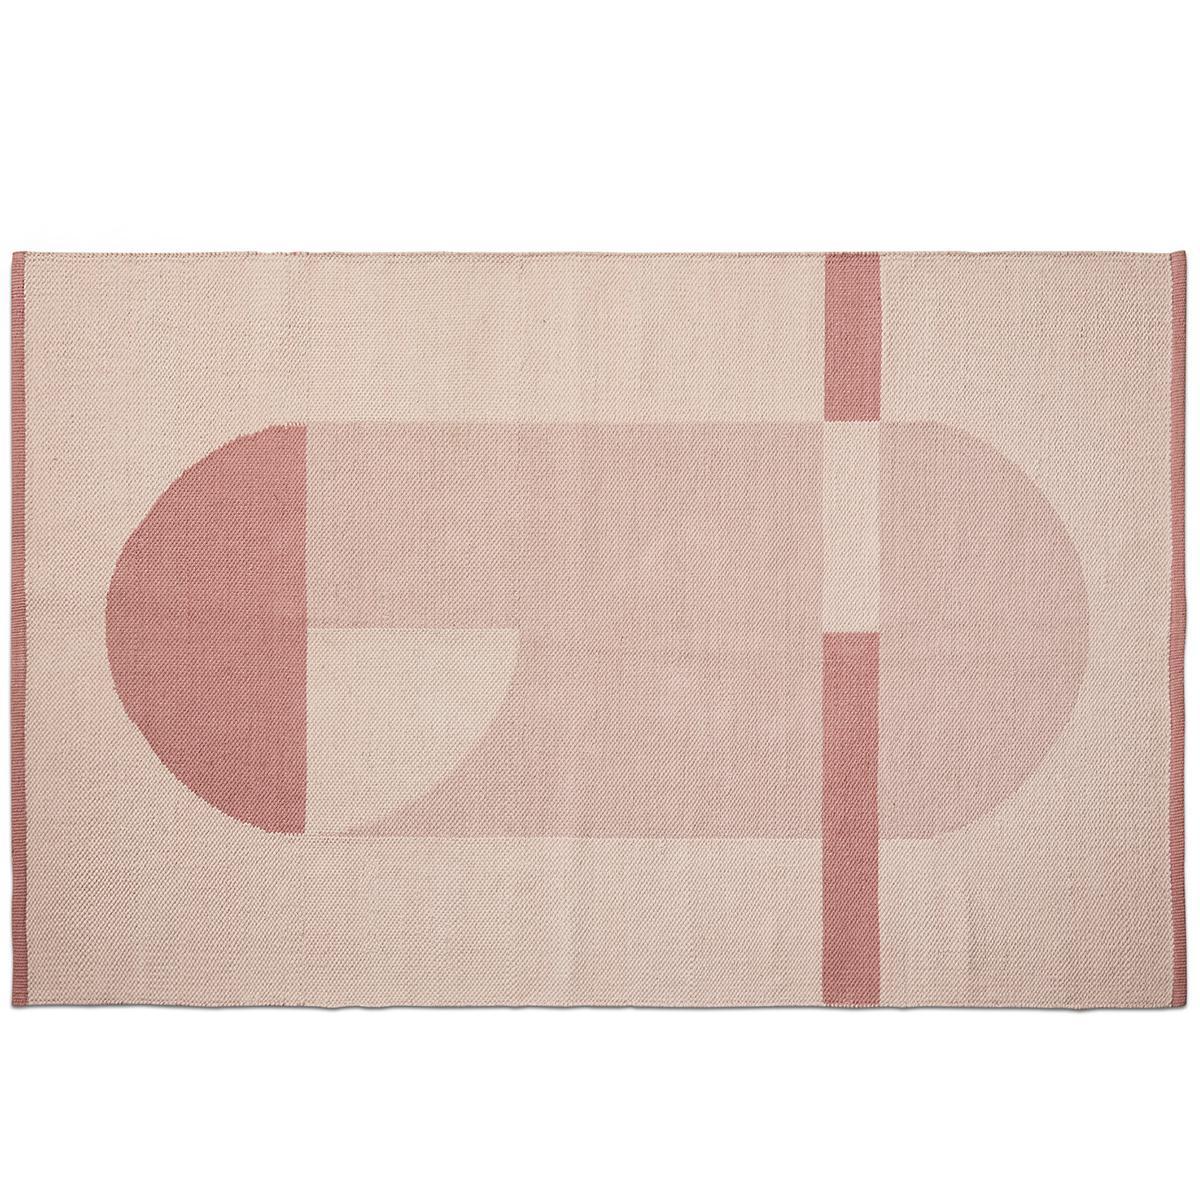 Alfombra 180x100cm ROOM COLLECTION Flexa light-dark dusty rosa